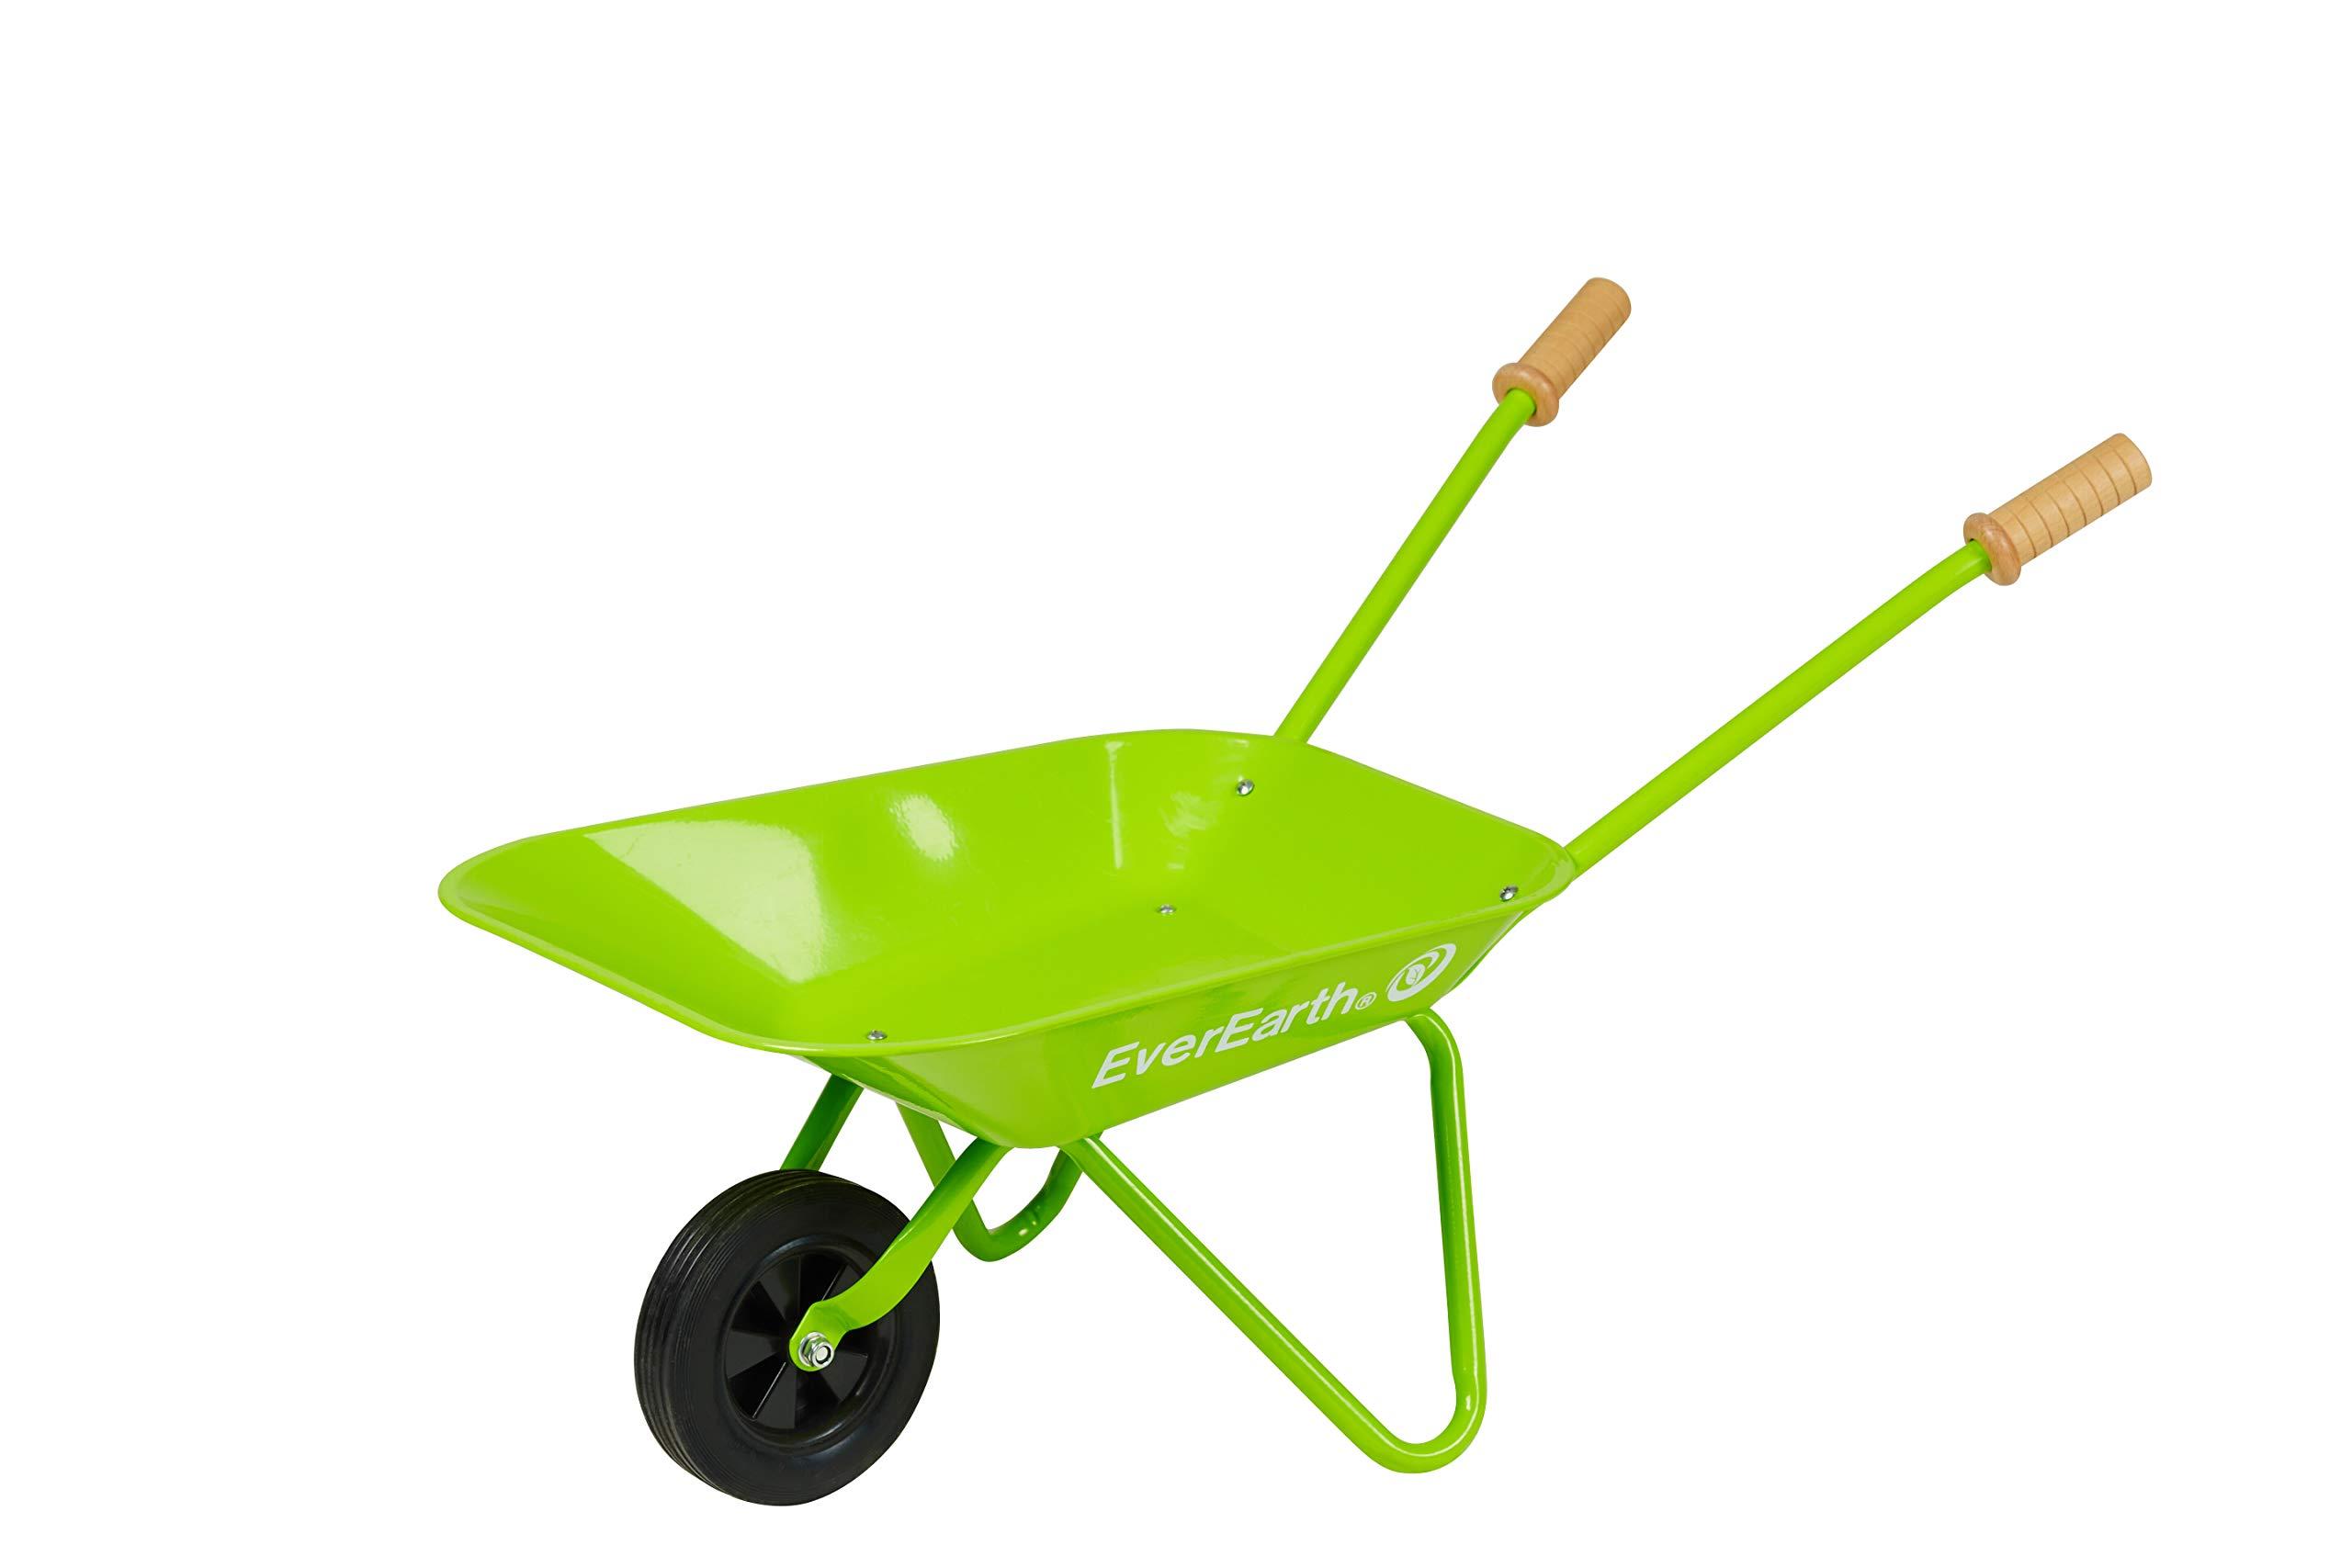 EverEarth Childrens Wheelbarrow EE33650 by EverEarth